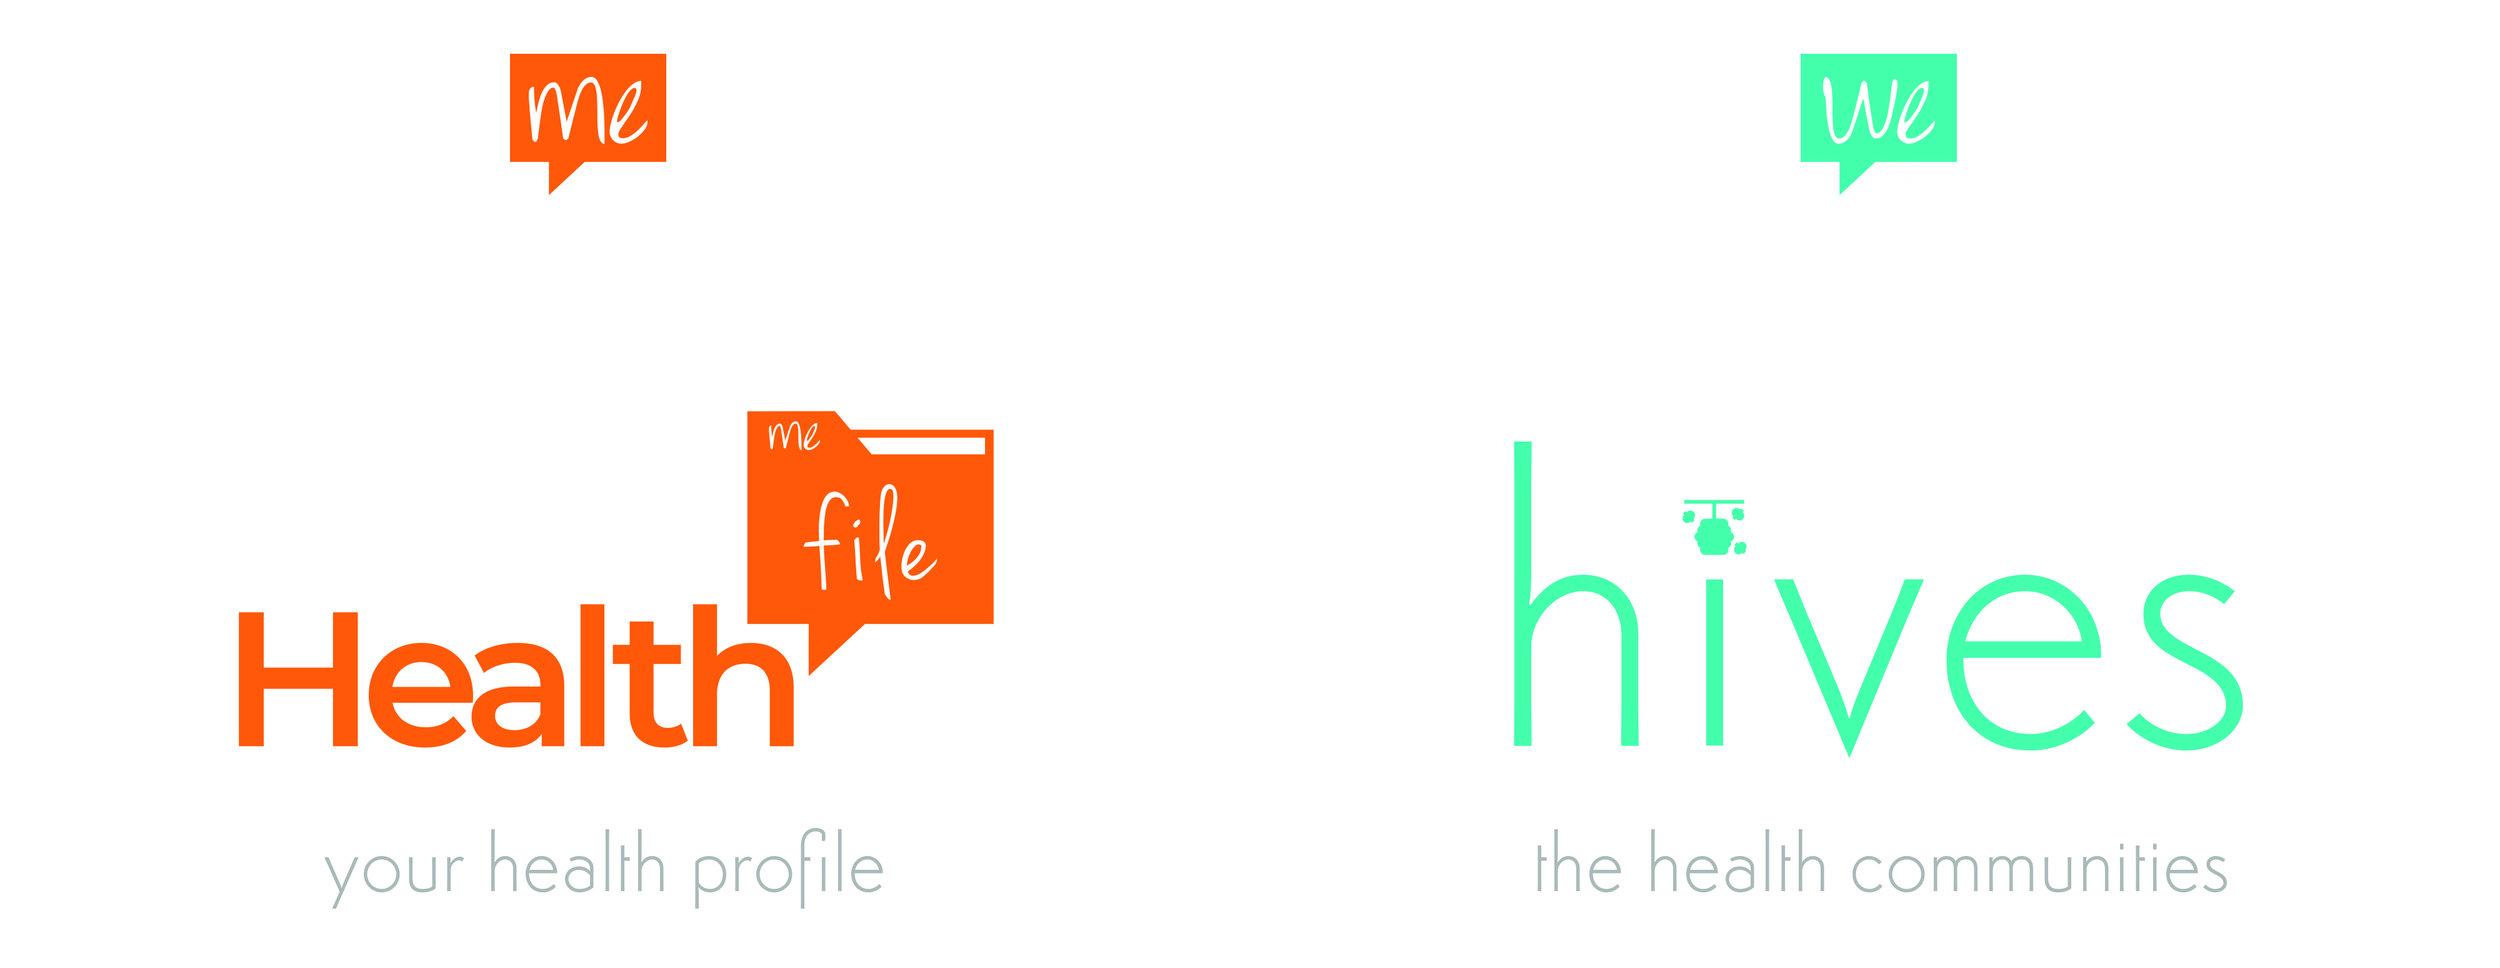 hf_hives_web.jpg